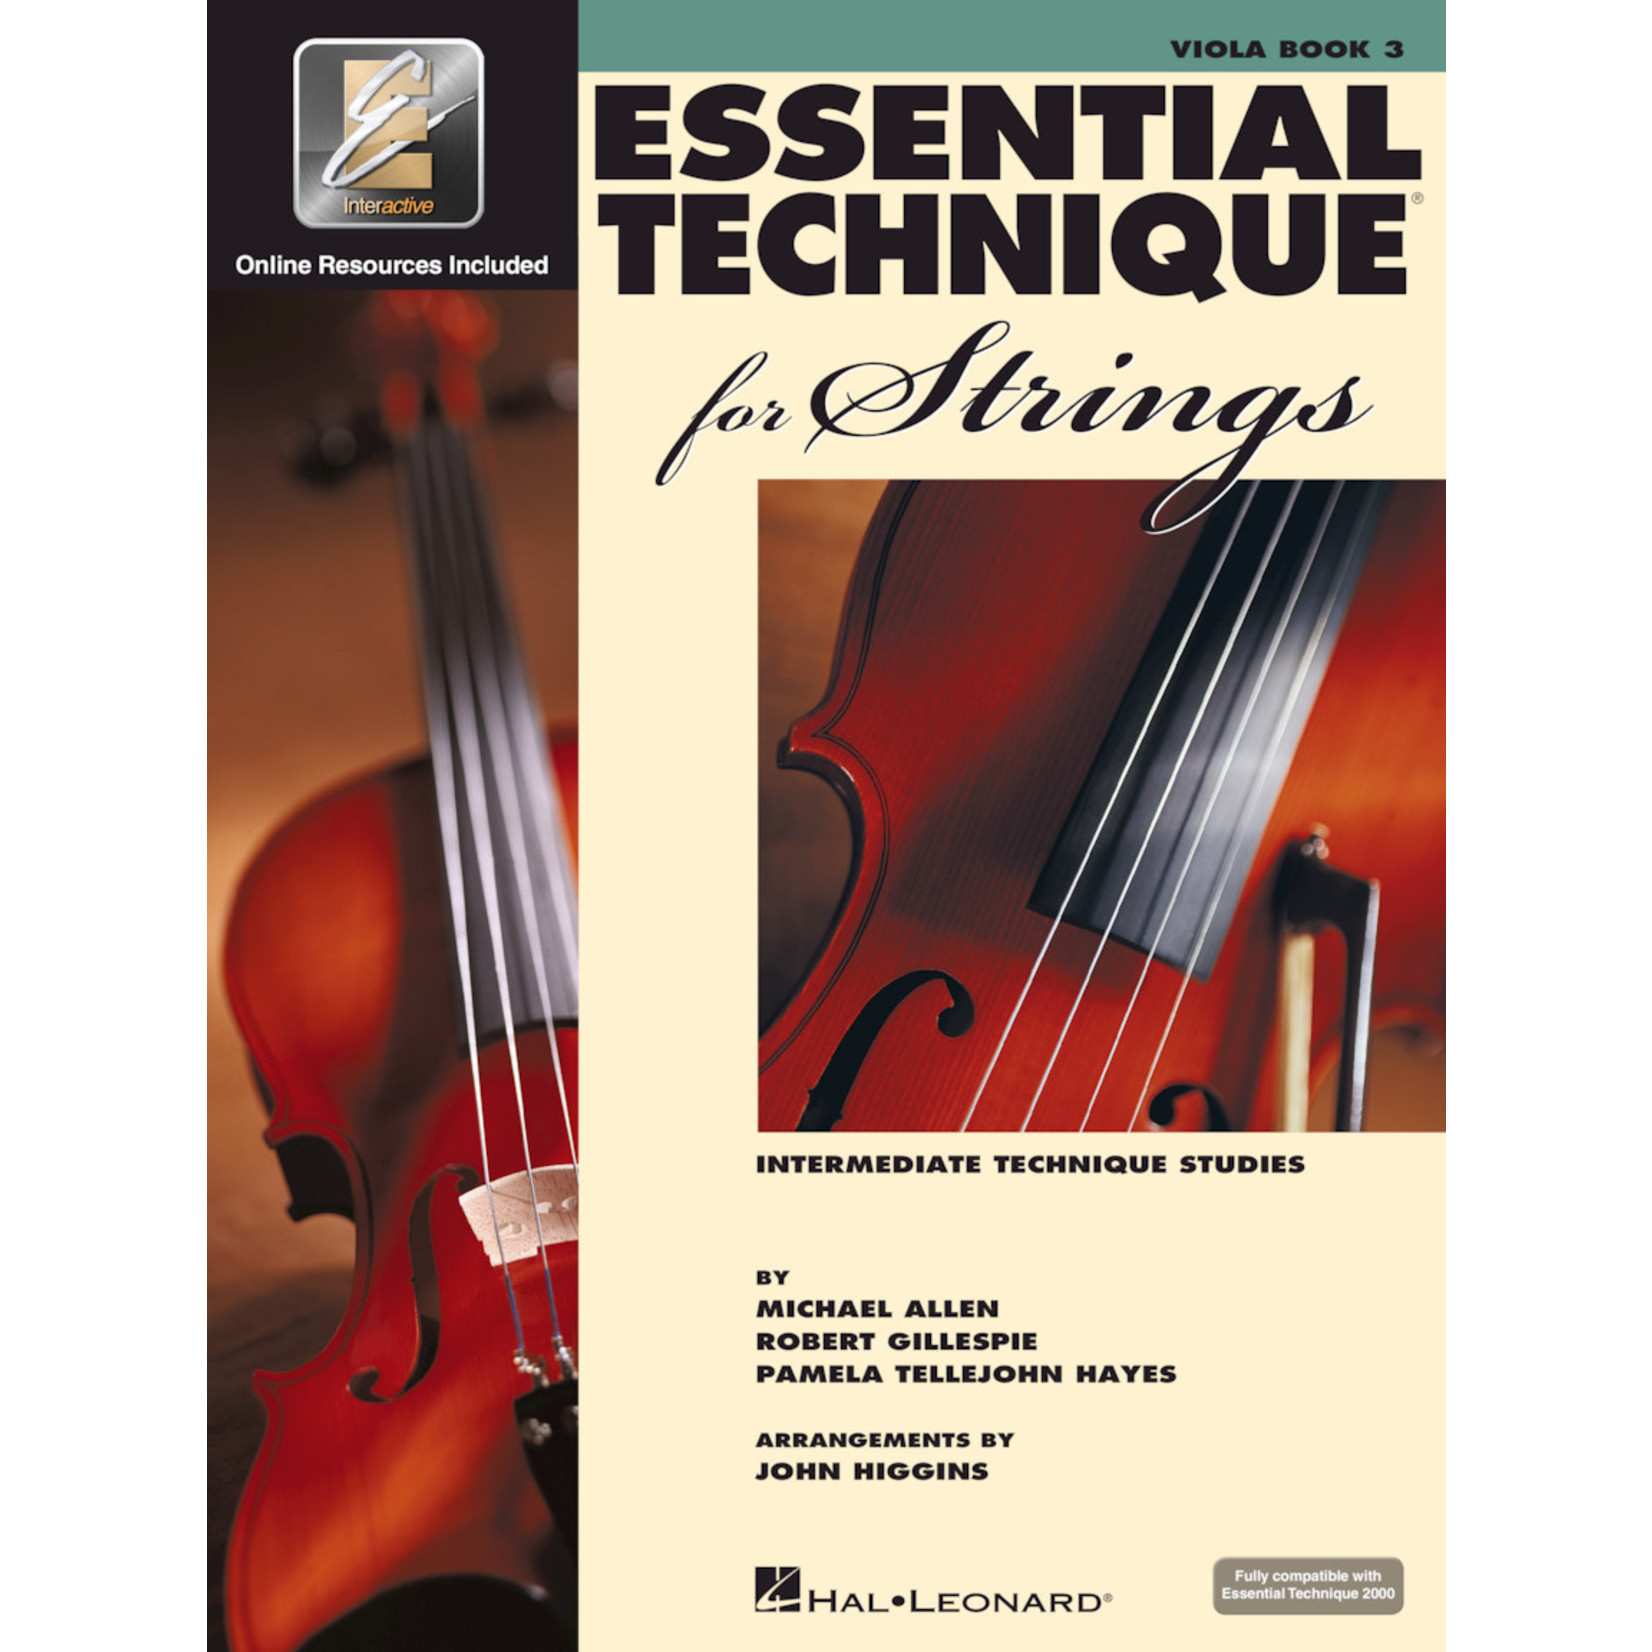 Hal Leonard Essential Technique for Strings Viola Book 3